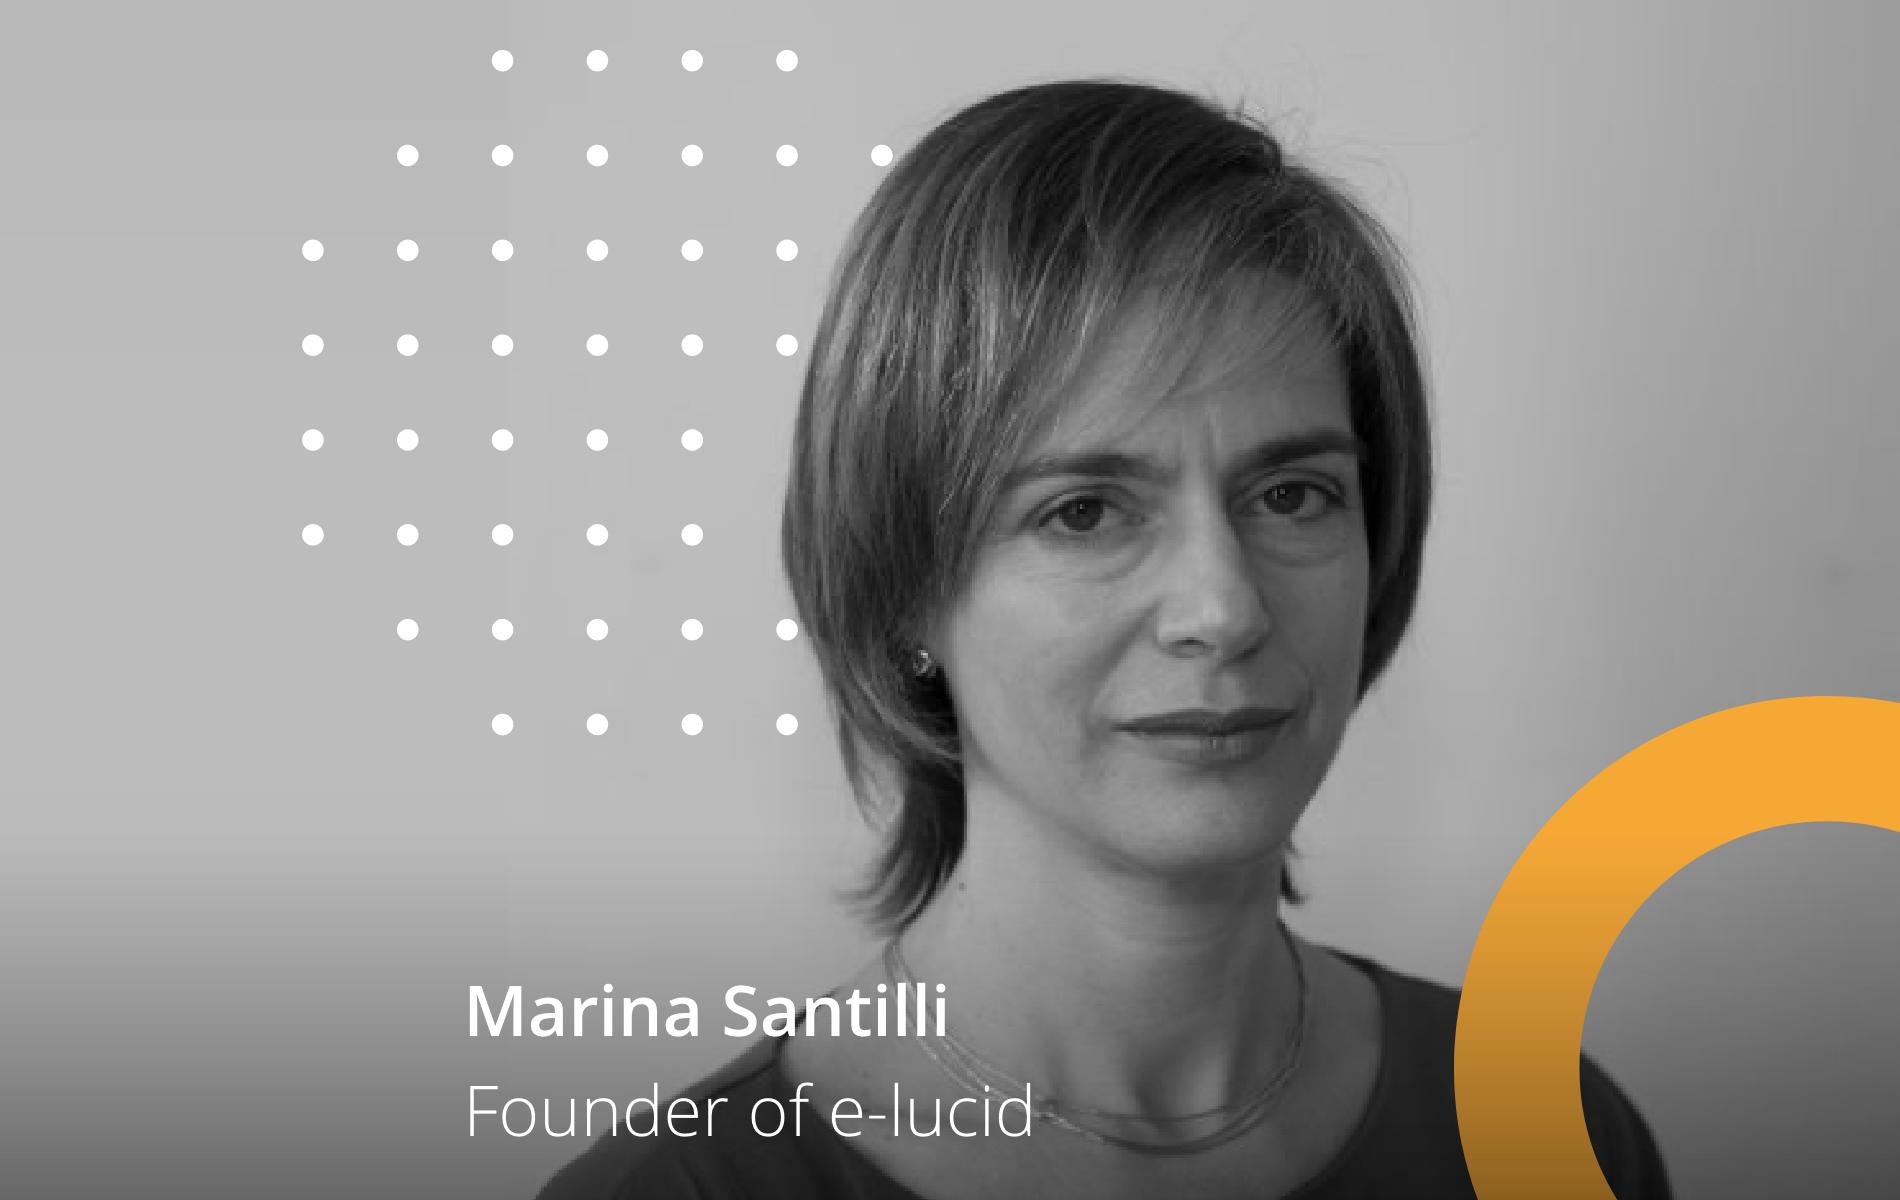 Marina Santilli